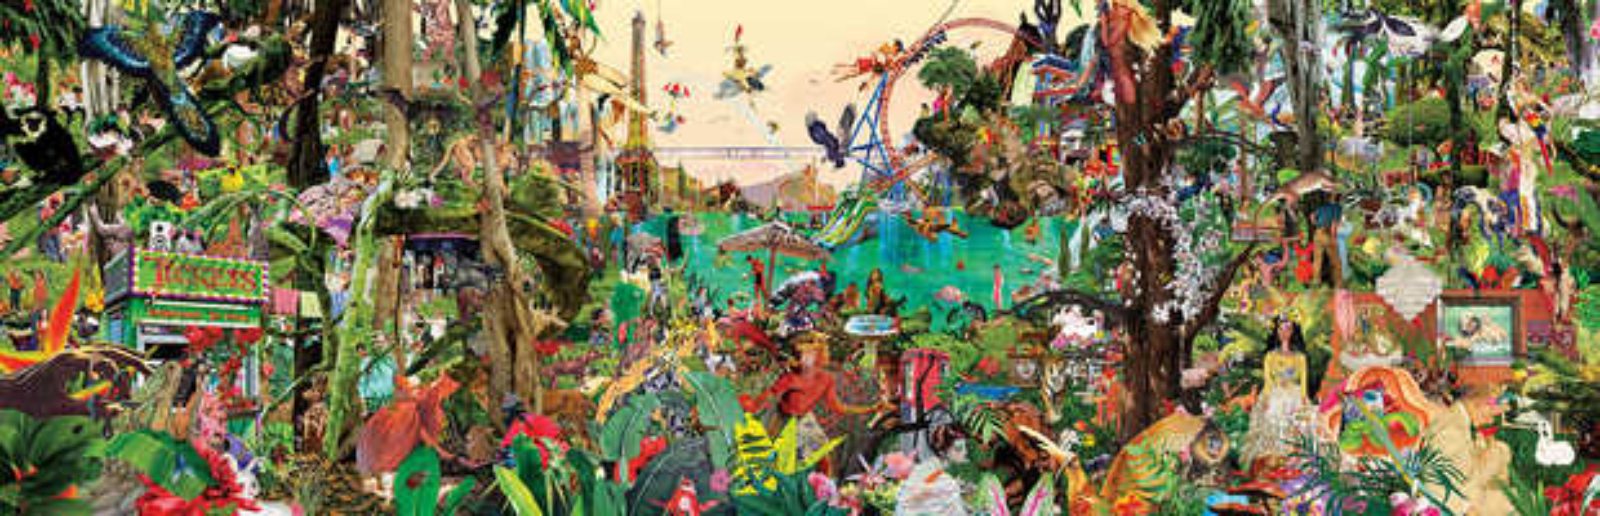 Jungle - Sanda Anderlon